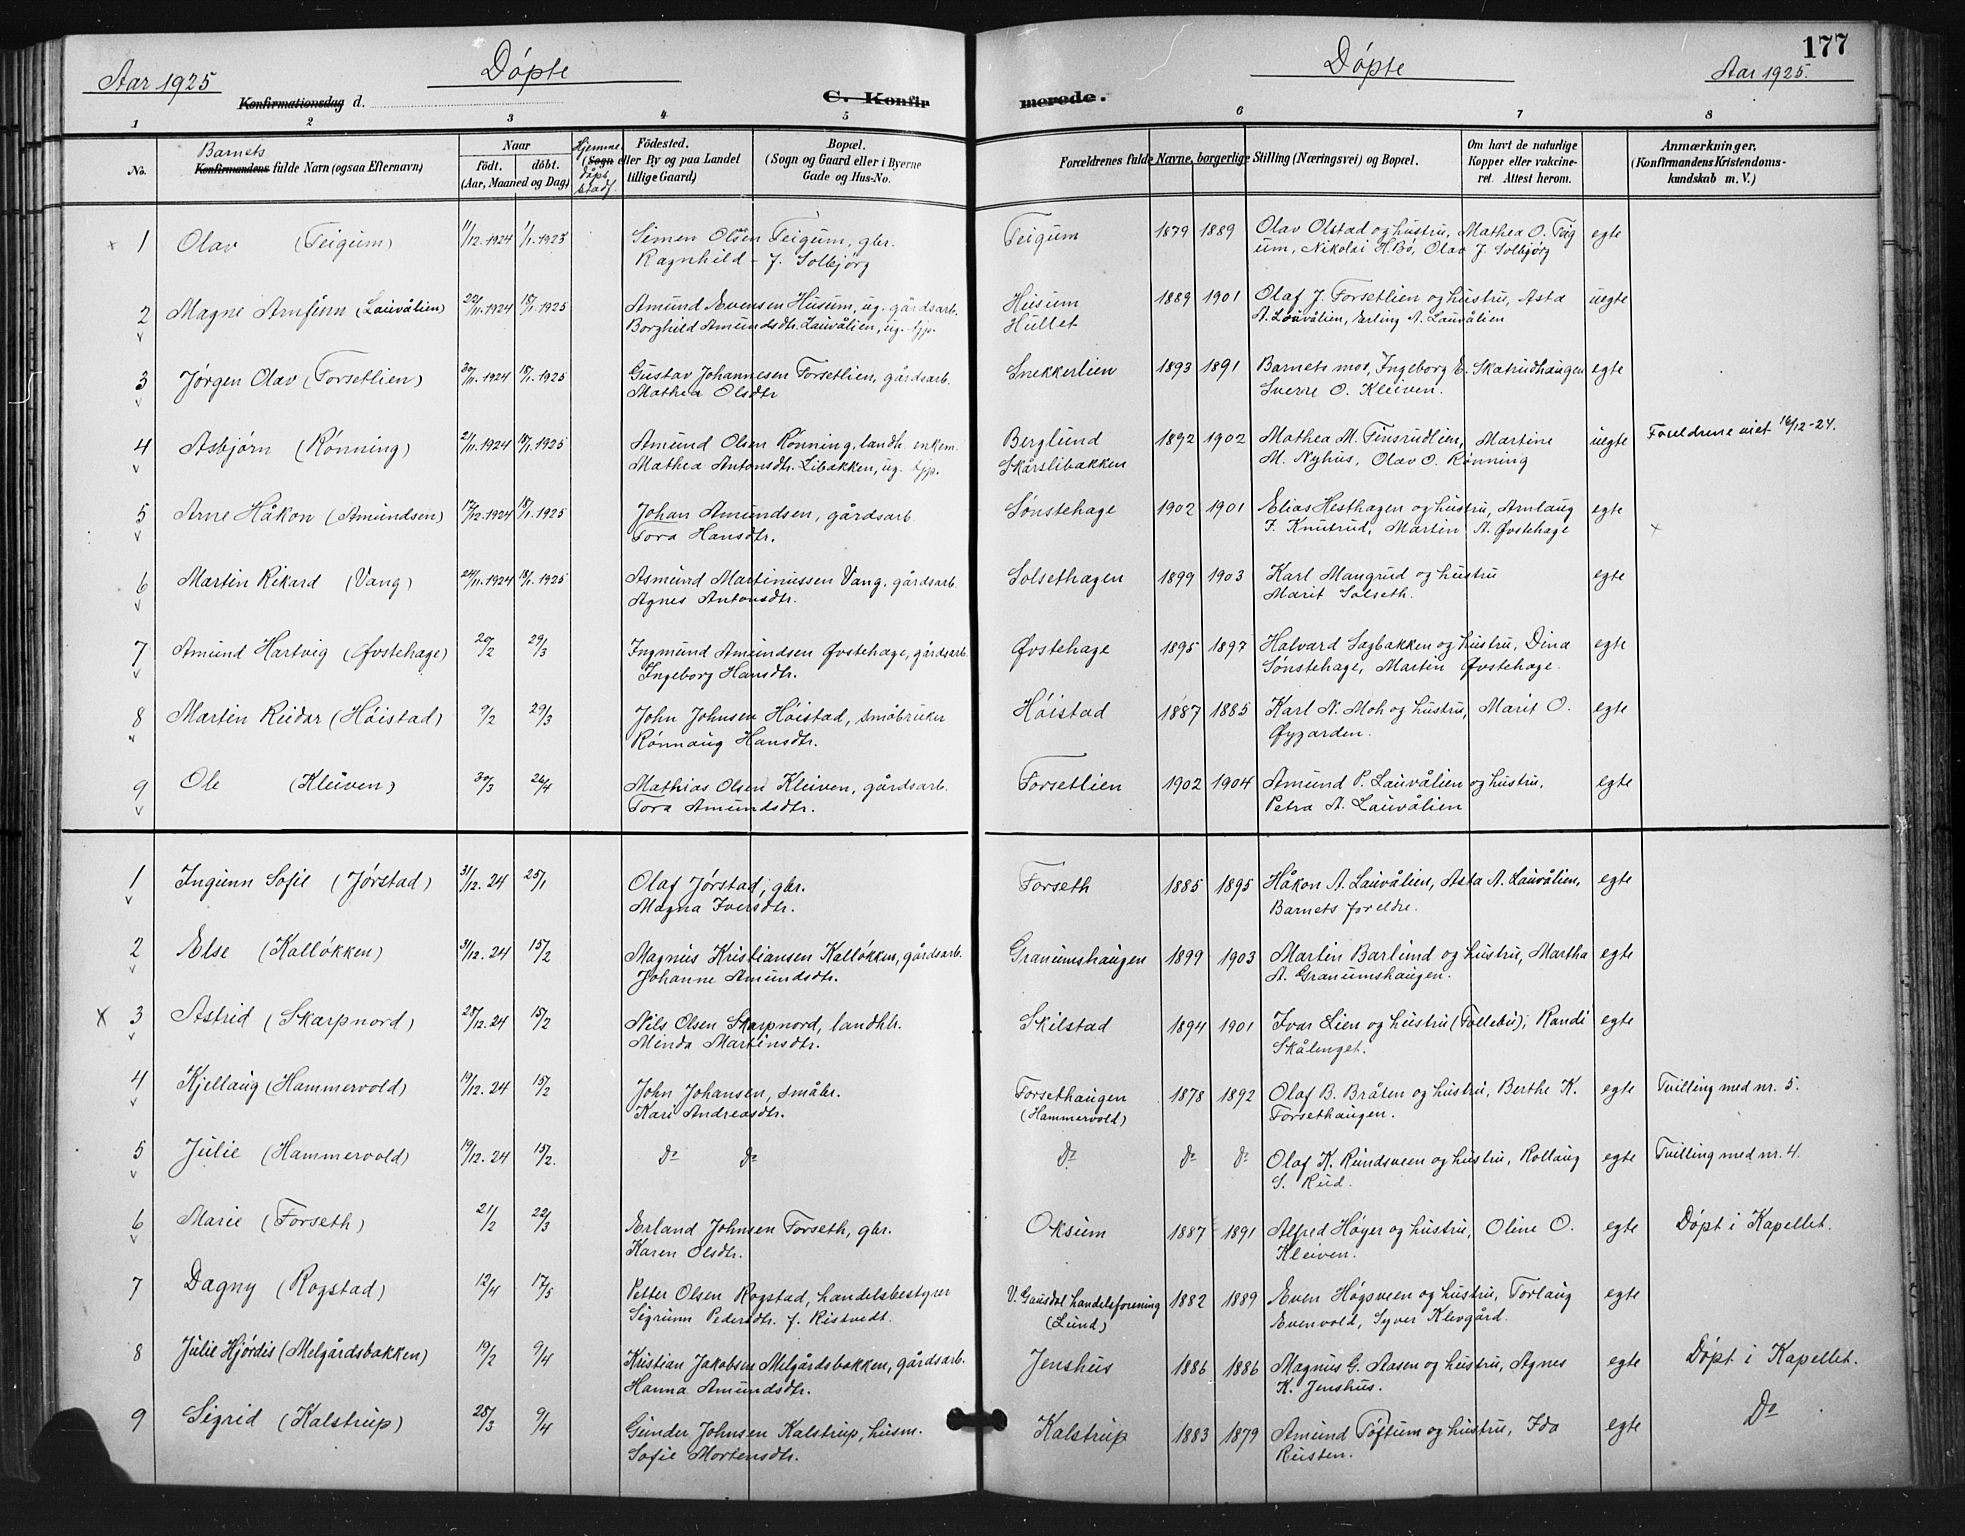 SAH, Vestre Gausdal prestekontor, Klokkerbok nr. 3, 1896-1925, s. 177